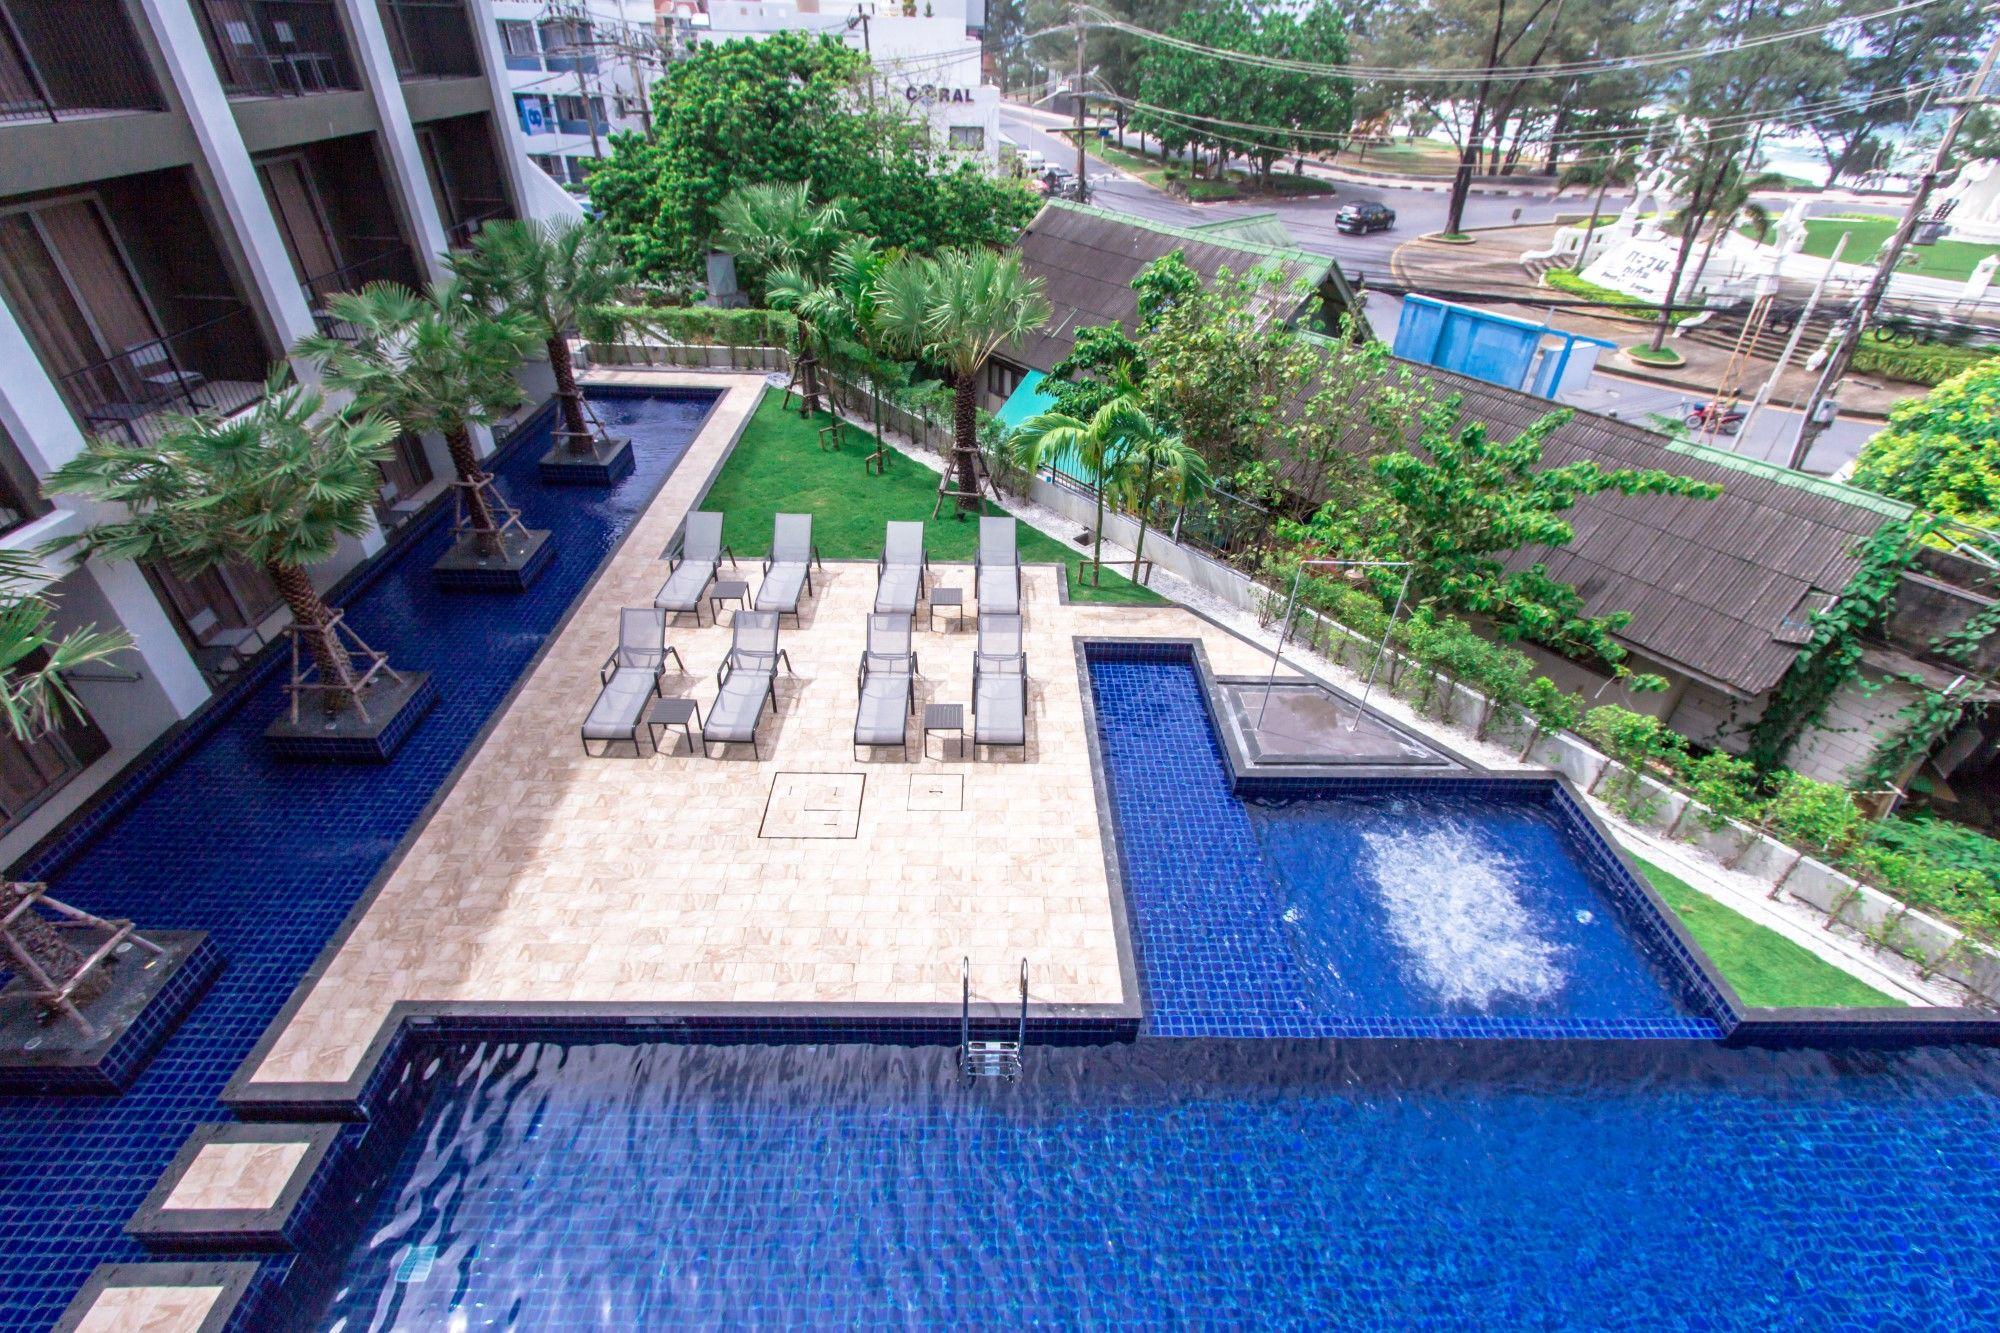 sugar-marina-resort-art-karon-beach-phuket